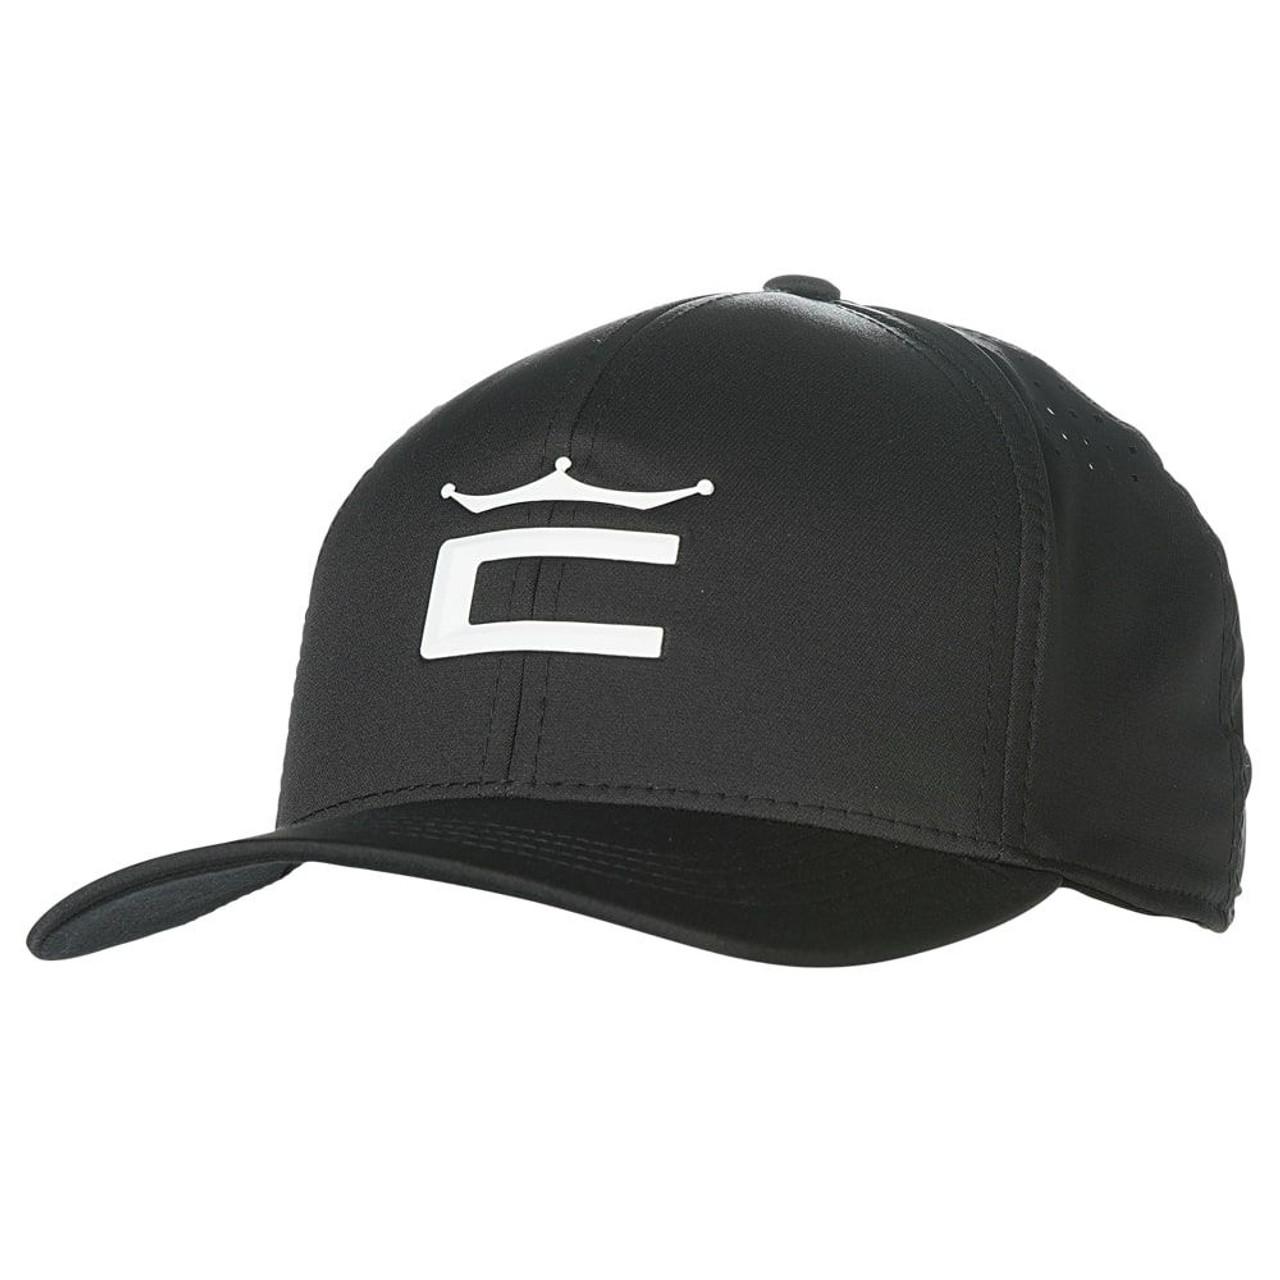 Cobra Tour Crown 110 Cap - Black / White